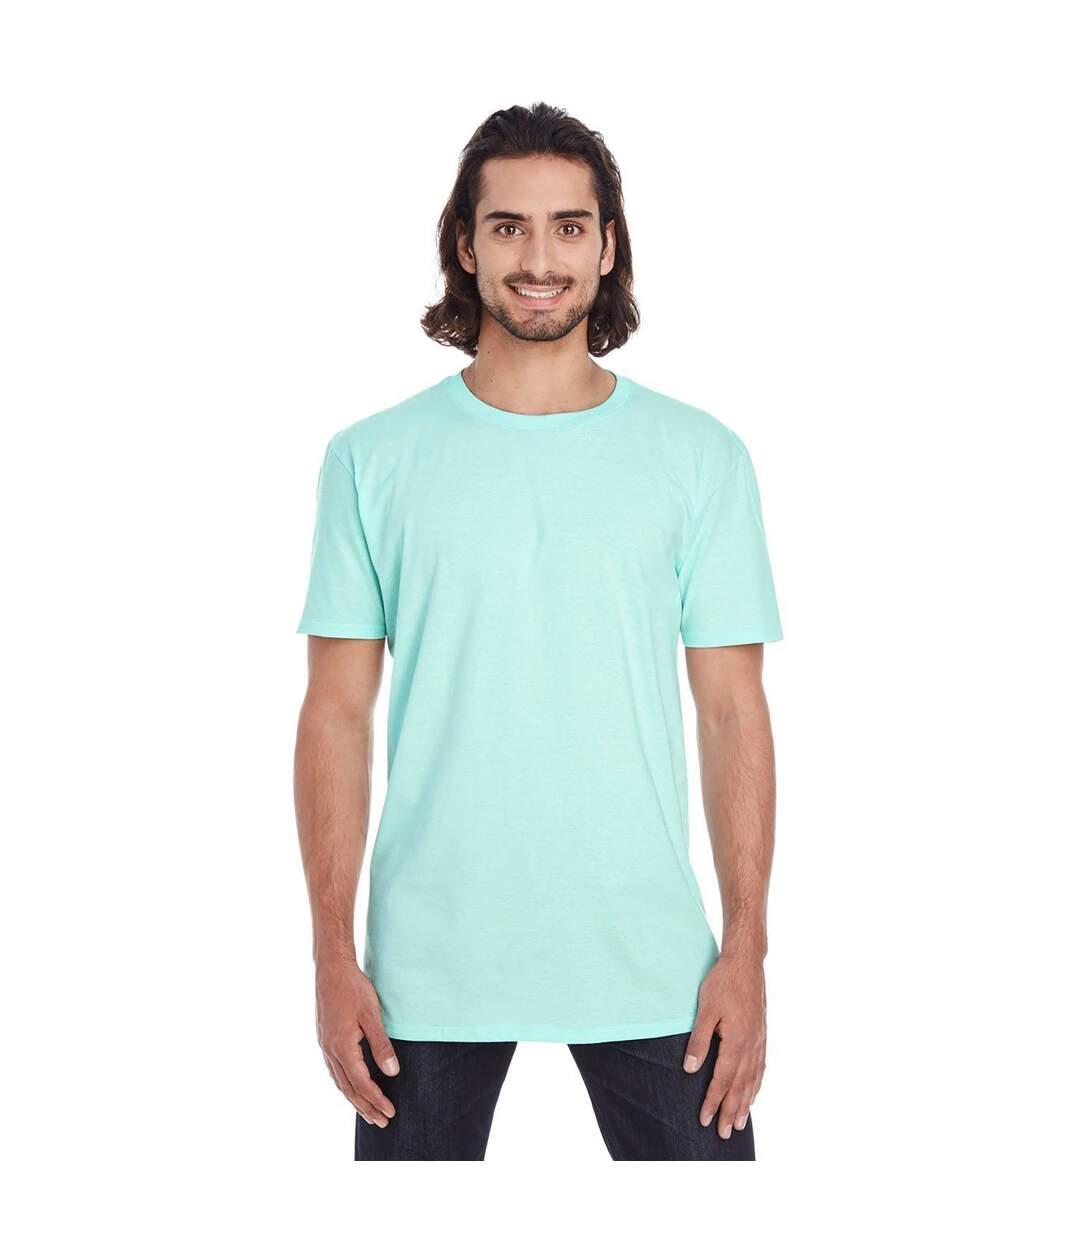 Anvil Mens Plain Short Sleeve Tri-Blend T-Shirt (Teal Ice) - UTRW3465